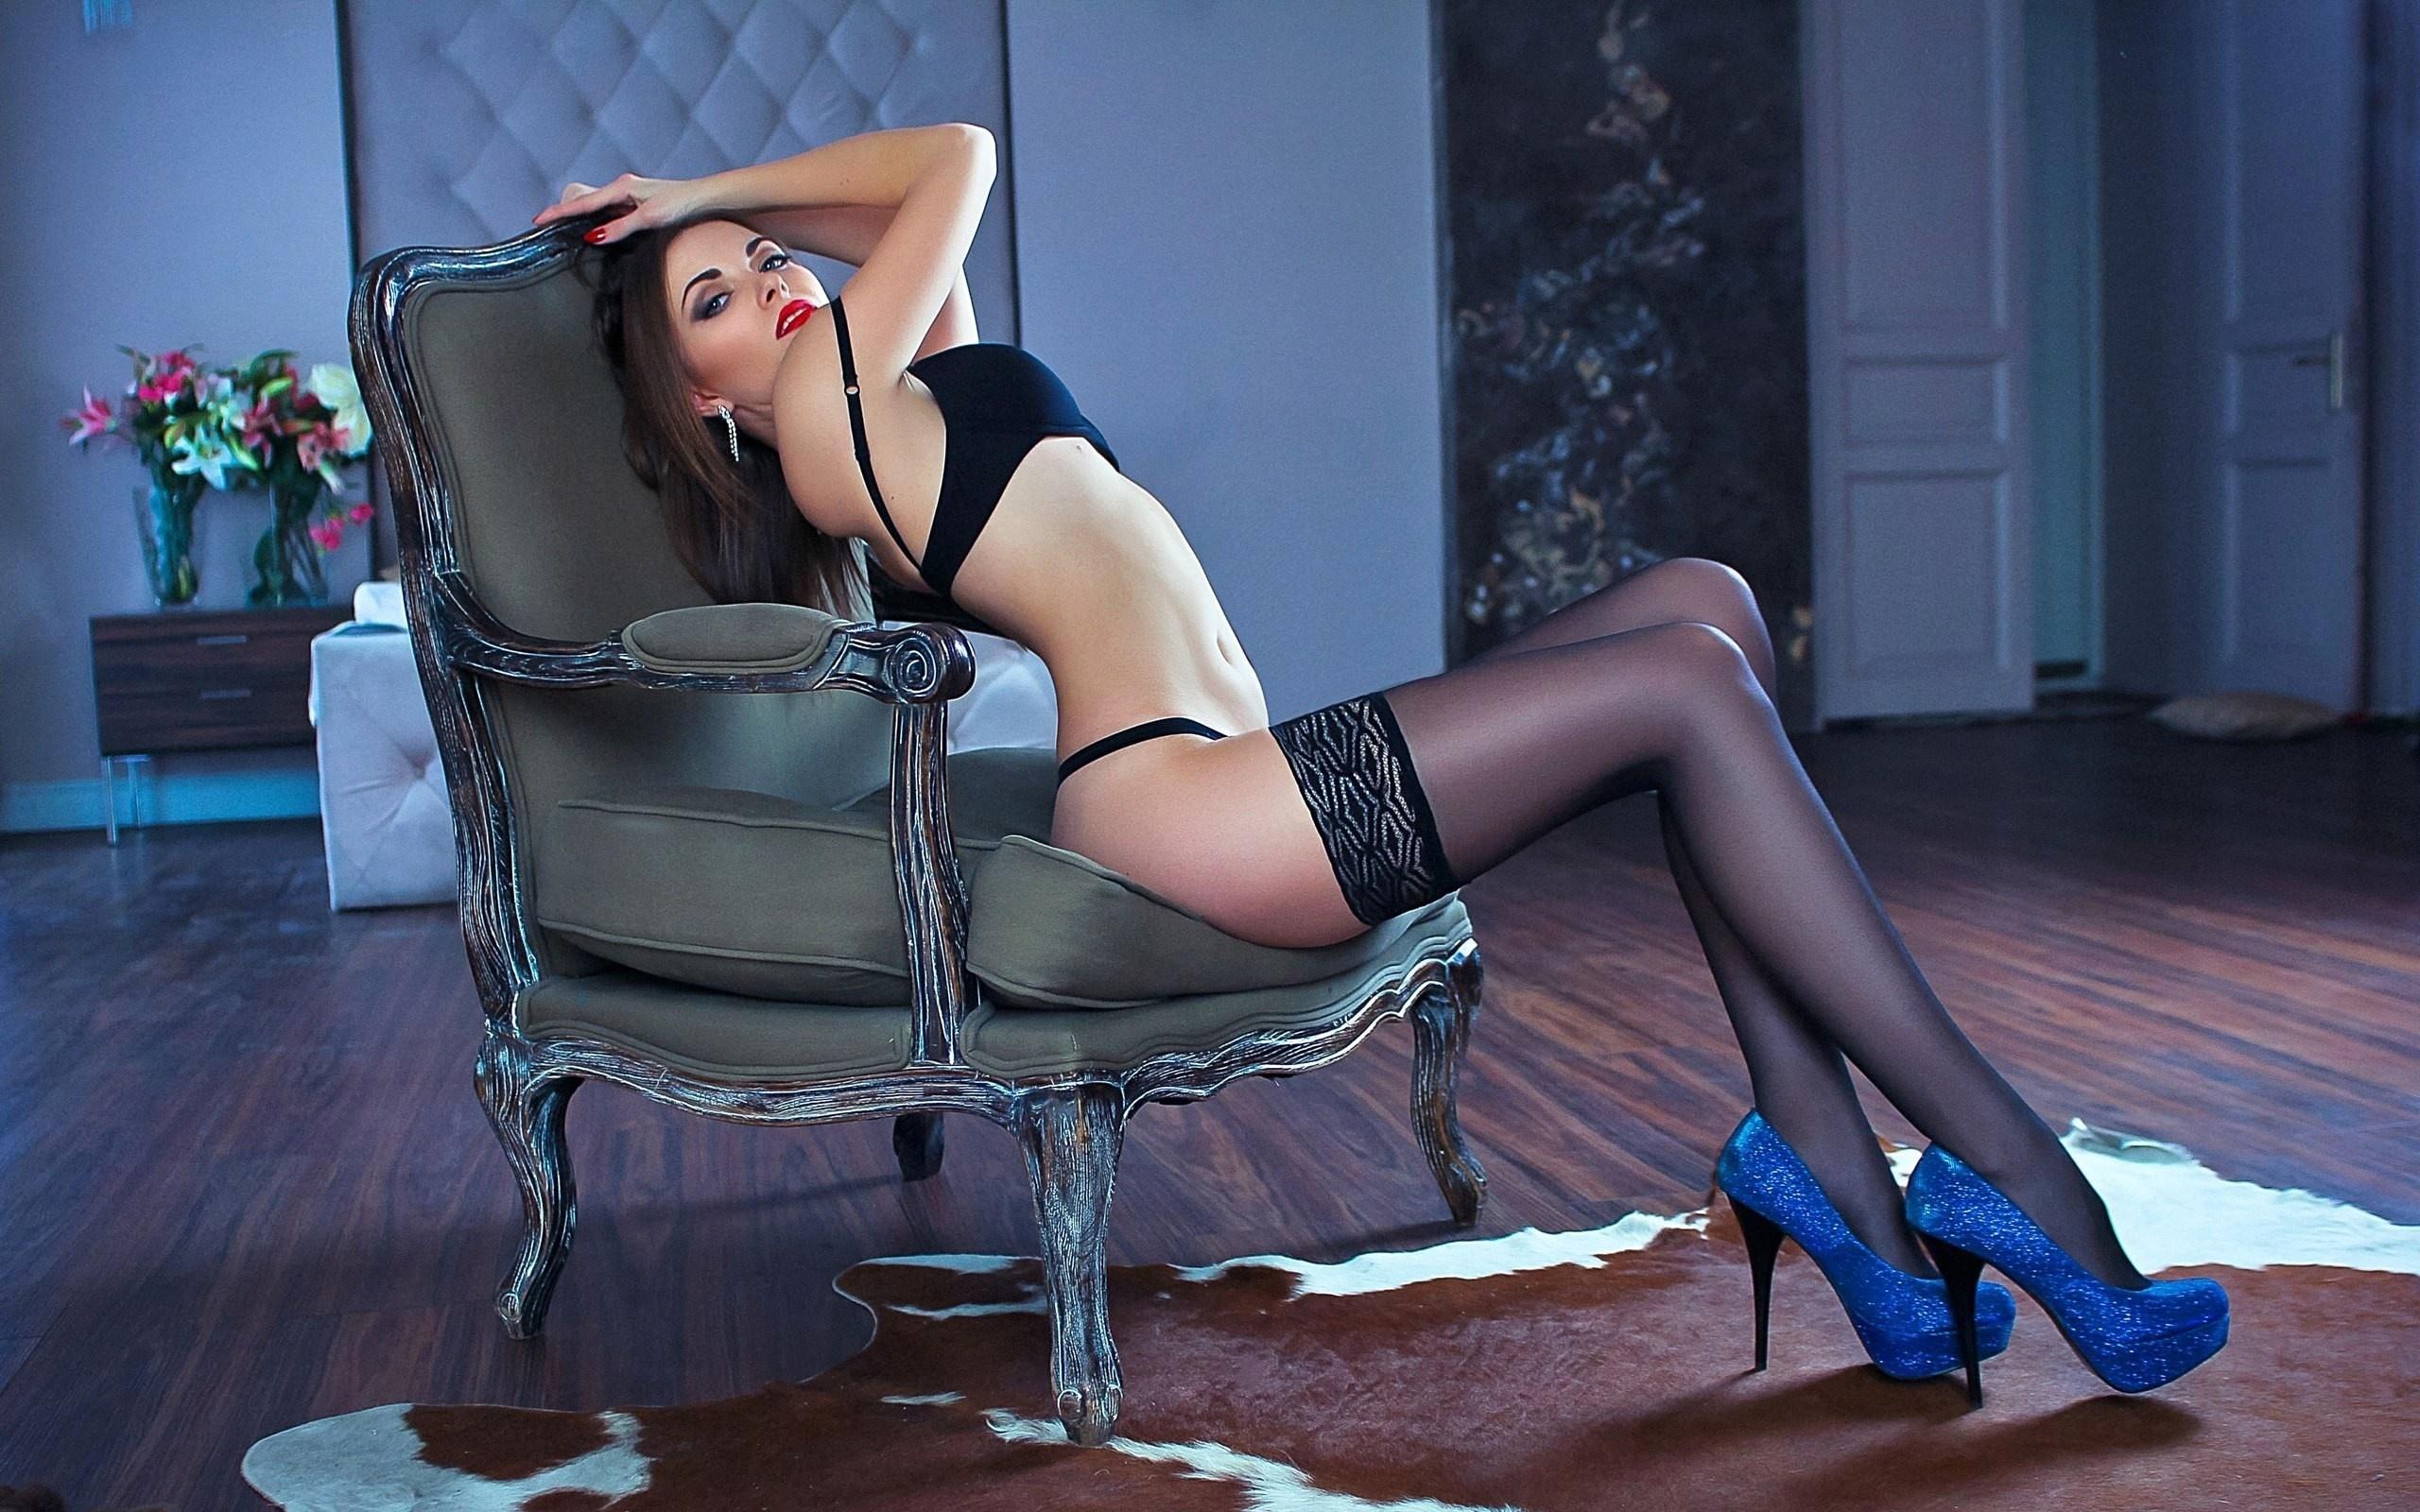 ладони, секси девушки на шпильках онлайн вас